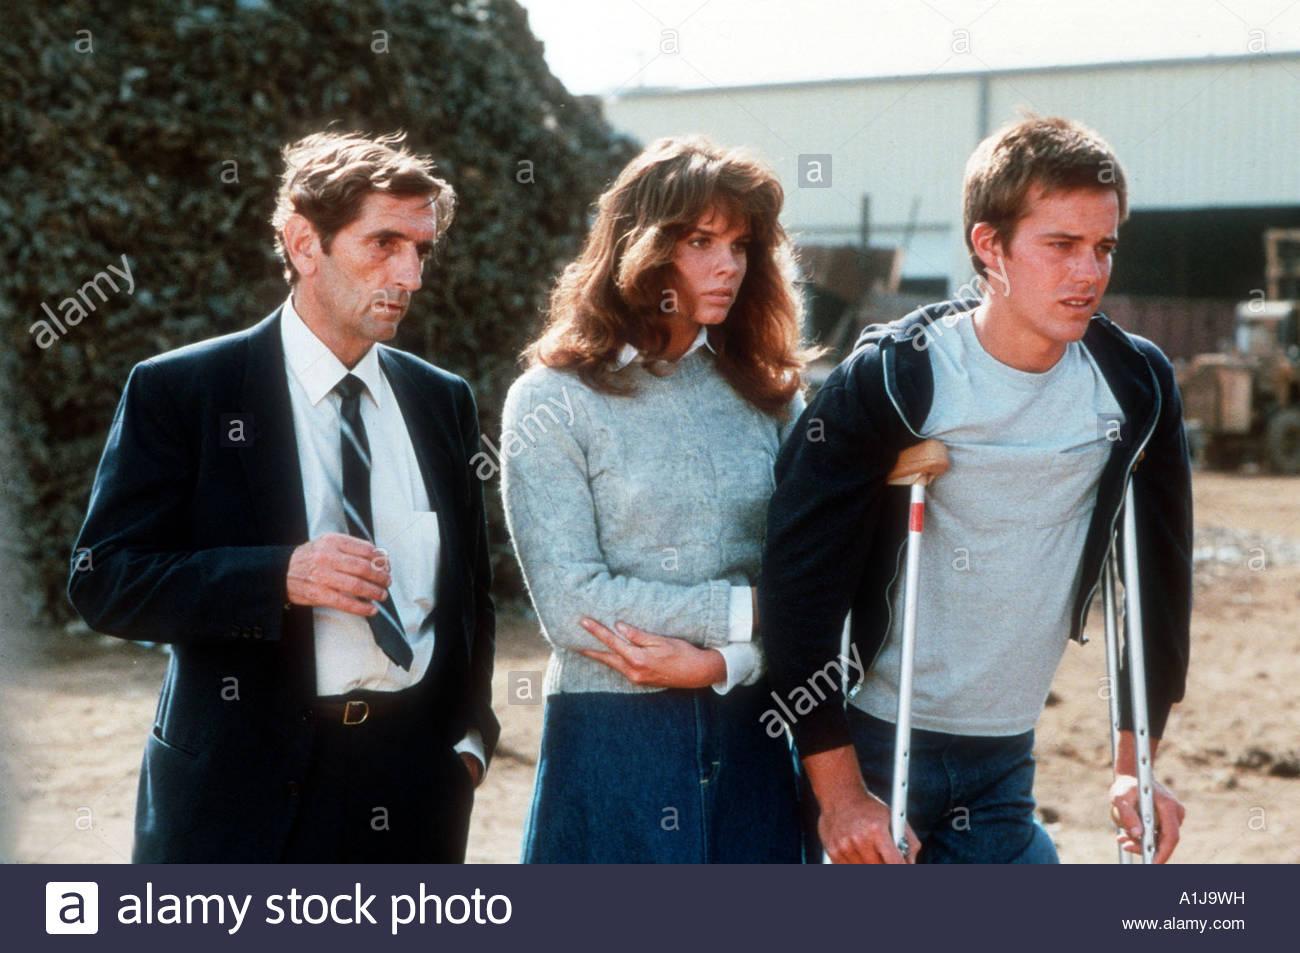 christine-year-1983-director-john-carpenter-alexandra-paul-john-stockwell-A1J9WH.jpg